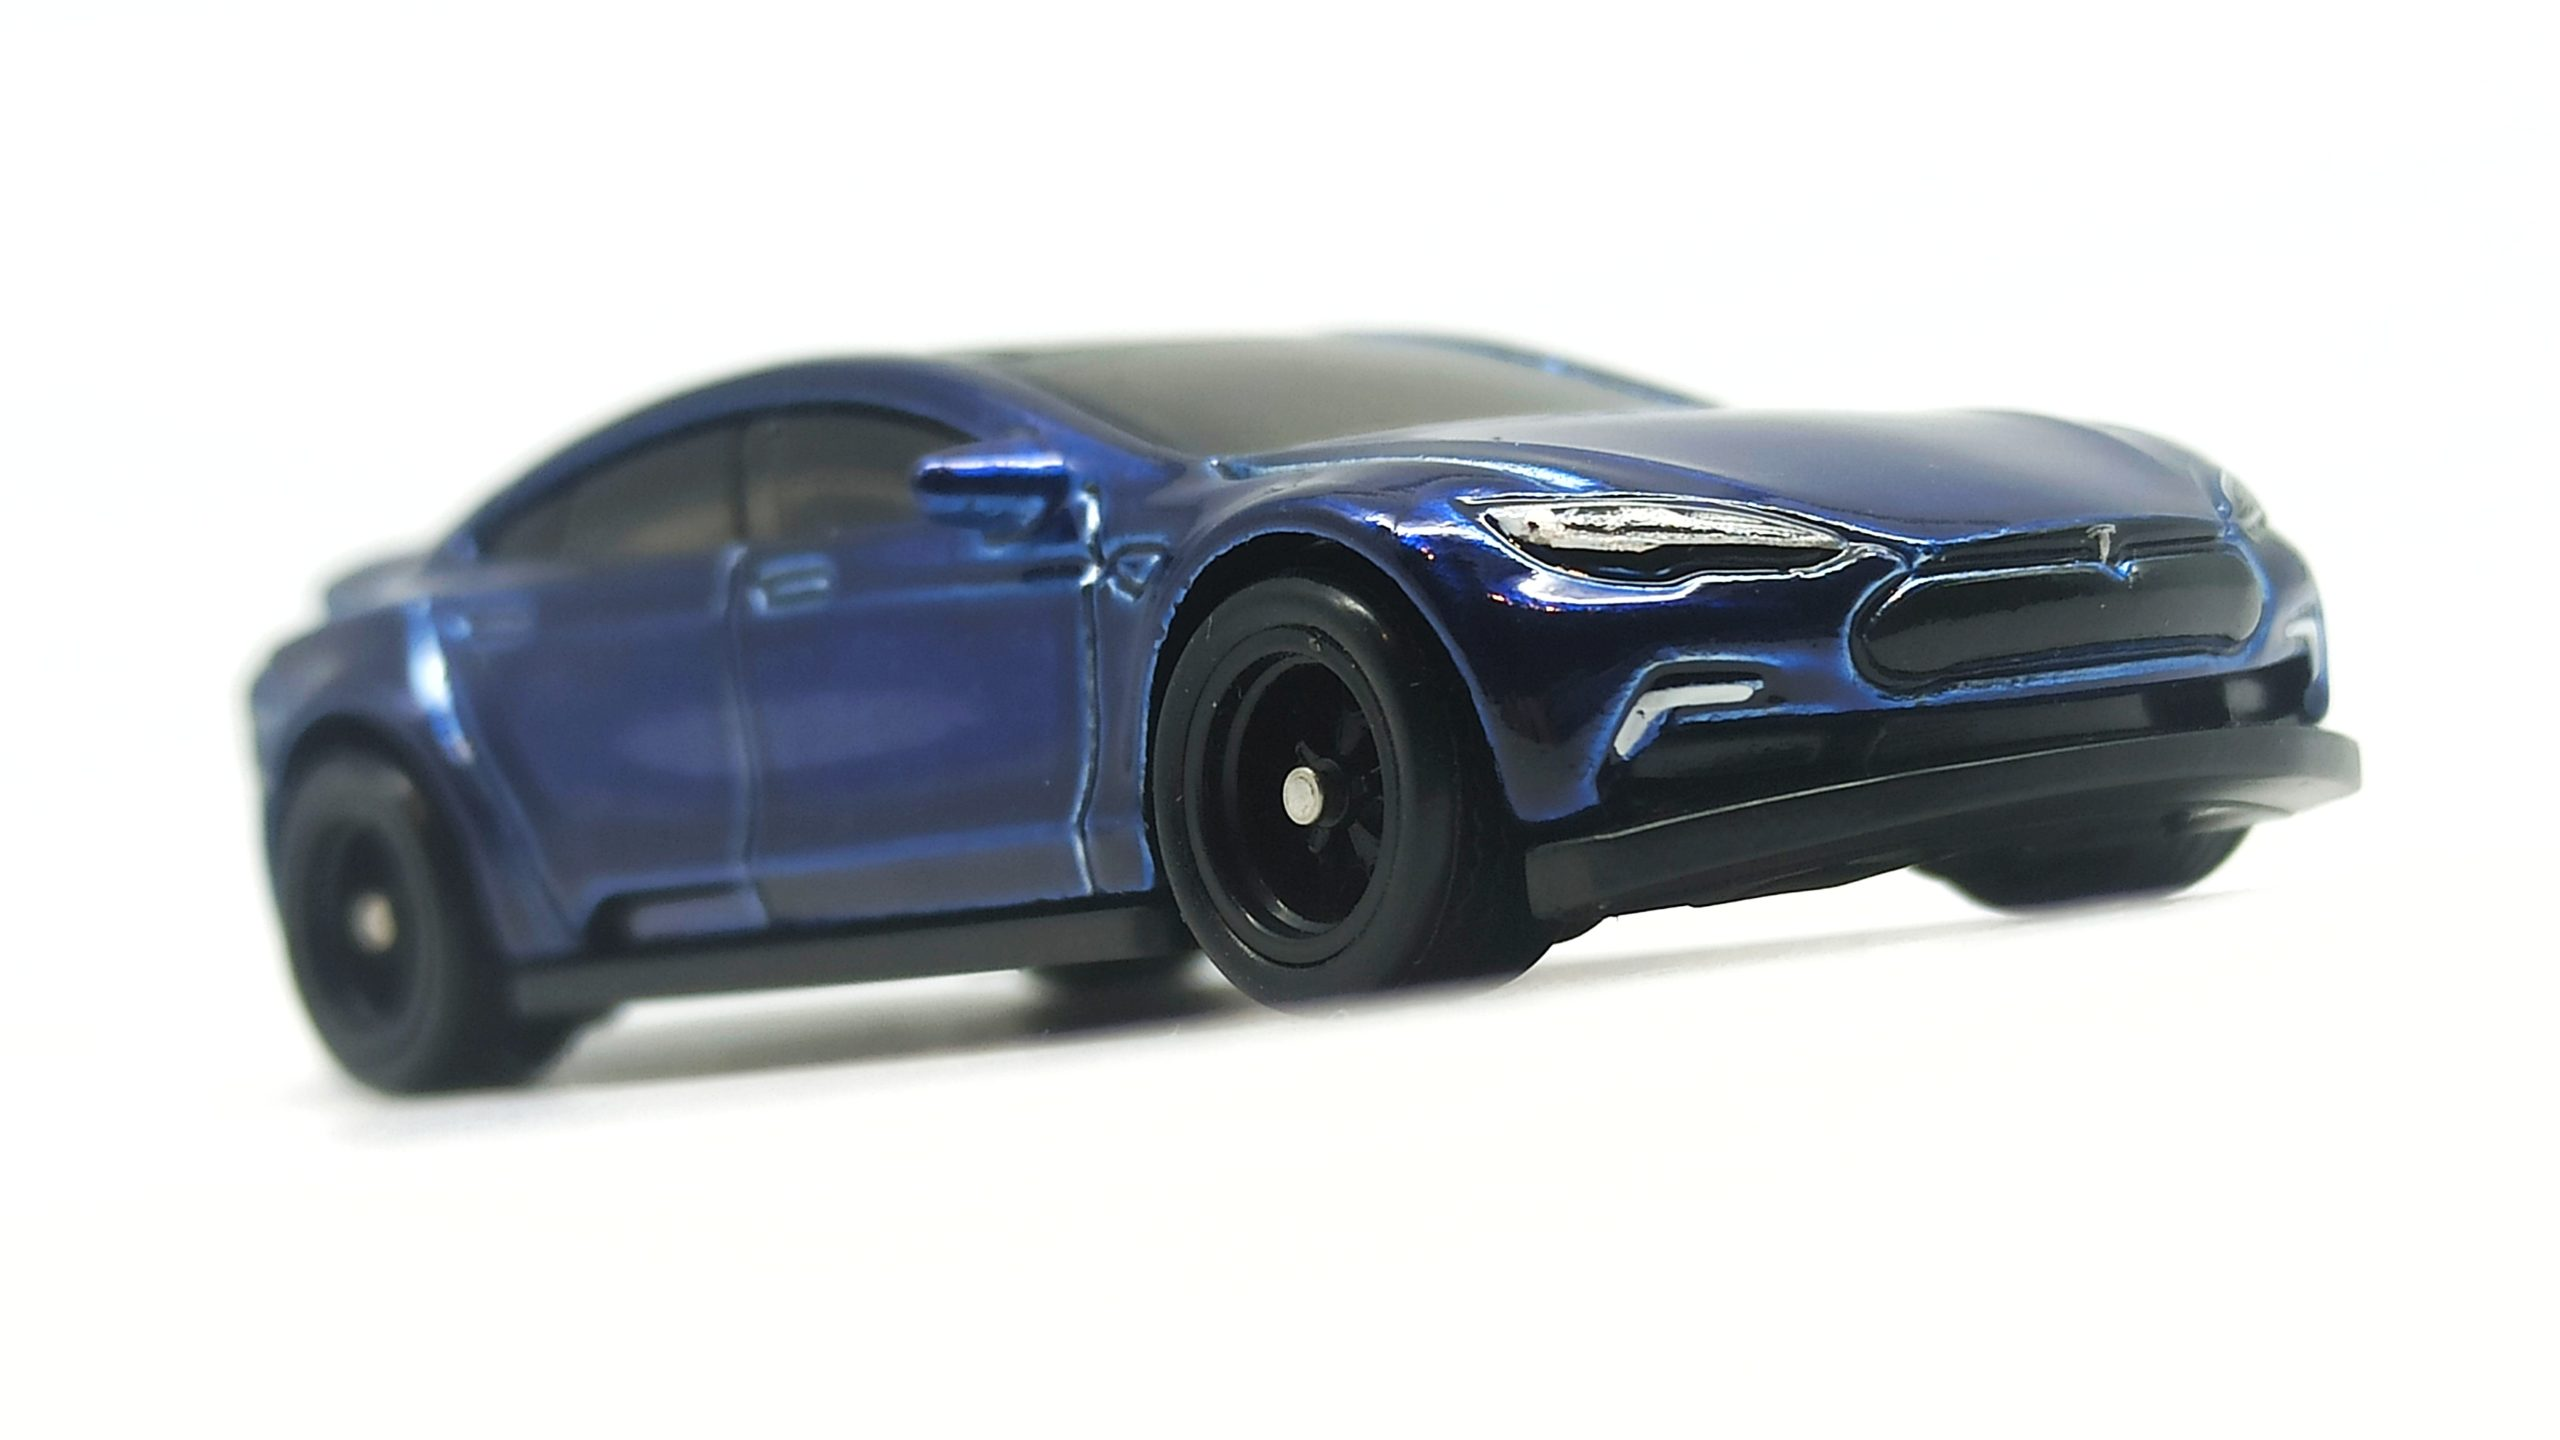 Hot Wheels Tesla Model S (FYG08) 2019 (226/250) HW Green Speed (4/5) indigo blue Super Treasure Hunt (STH) front angle